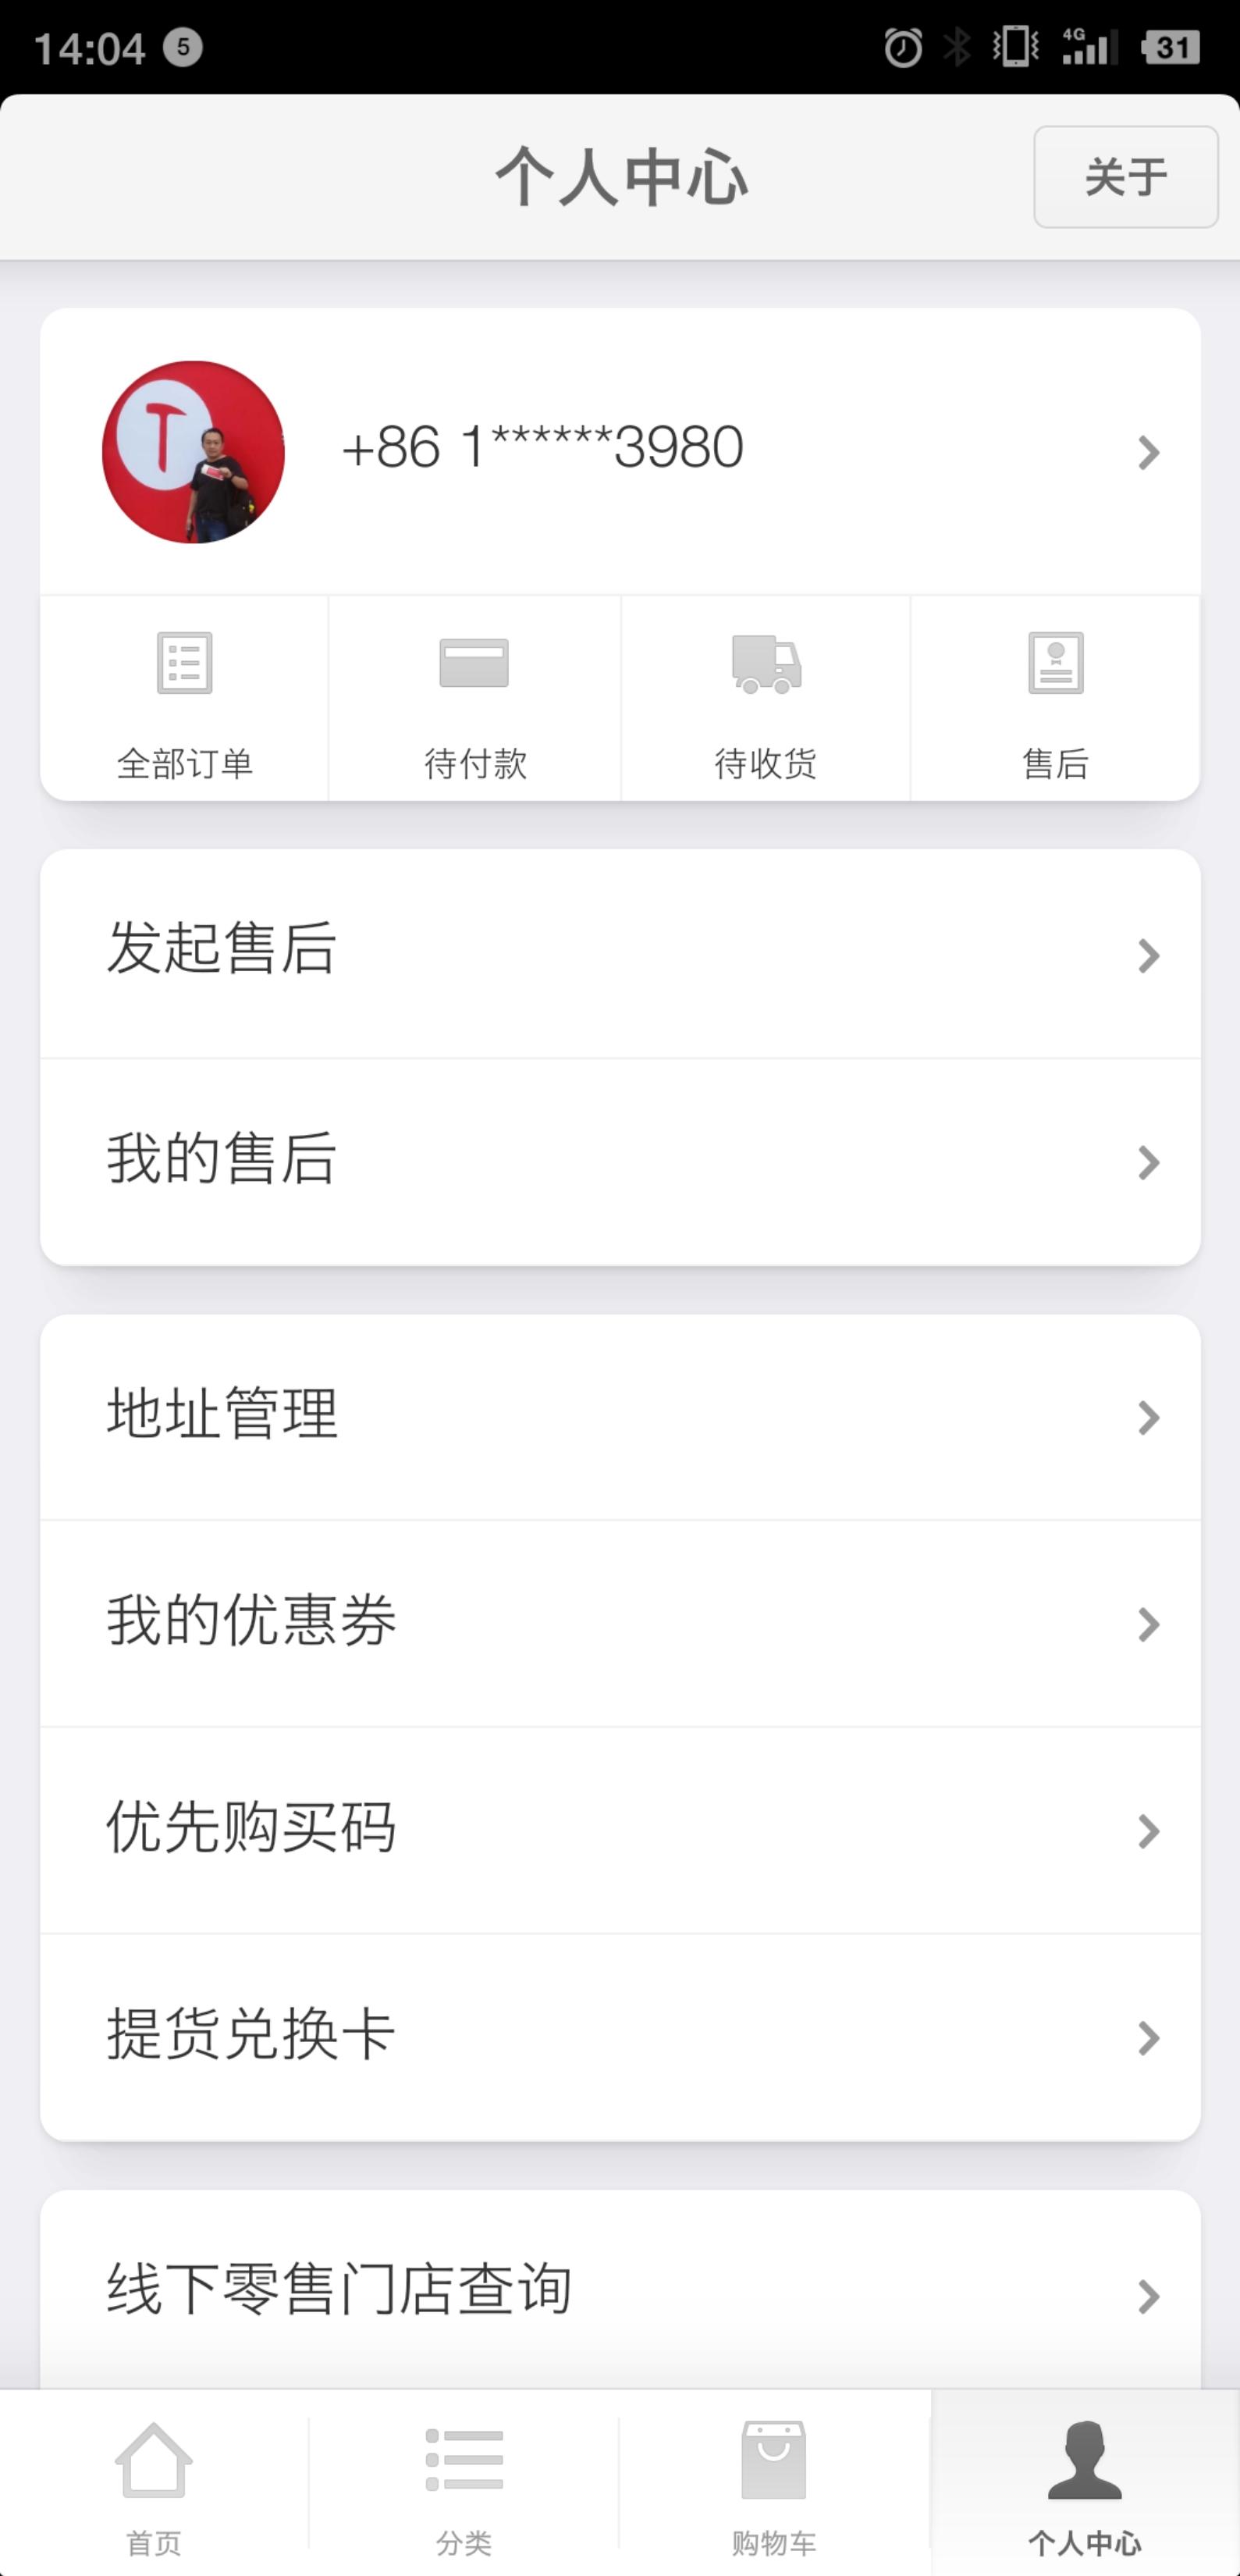 Screenshot_2018-06-11-14-04-46-668_????.png